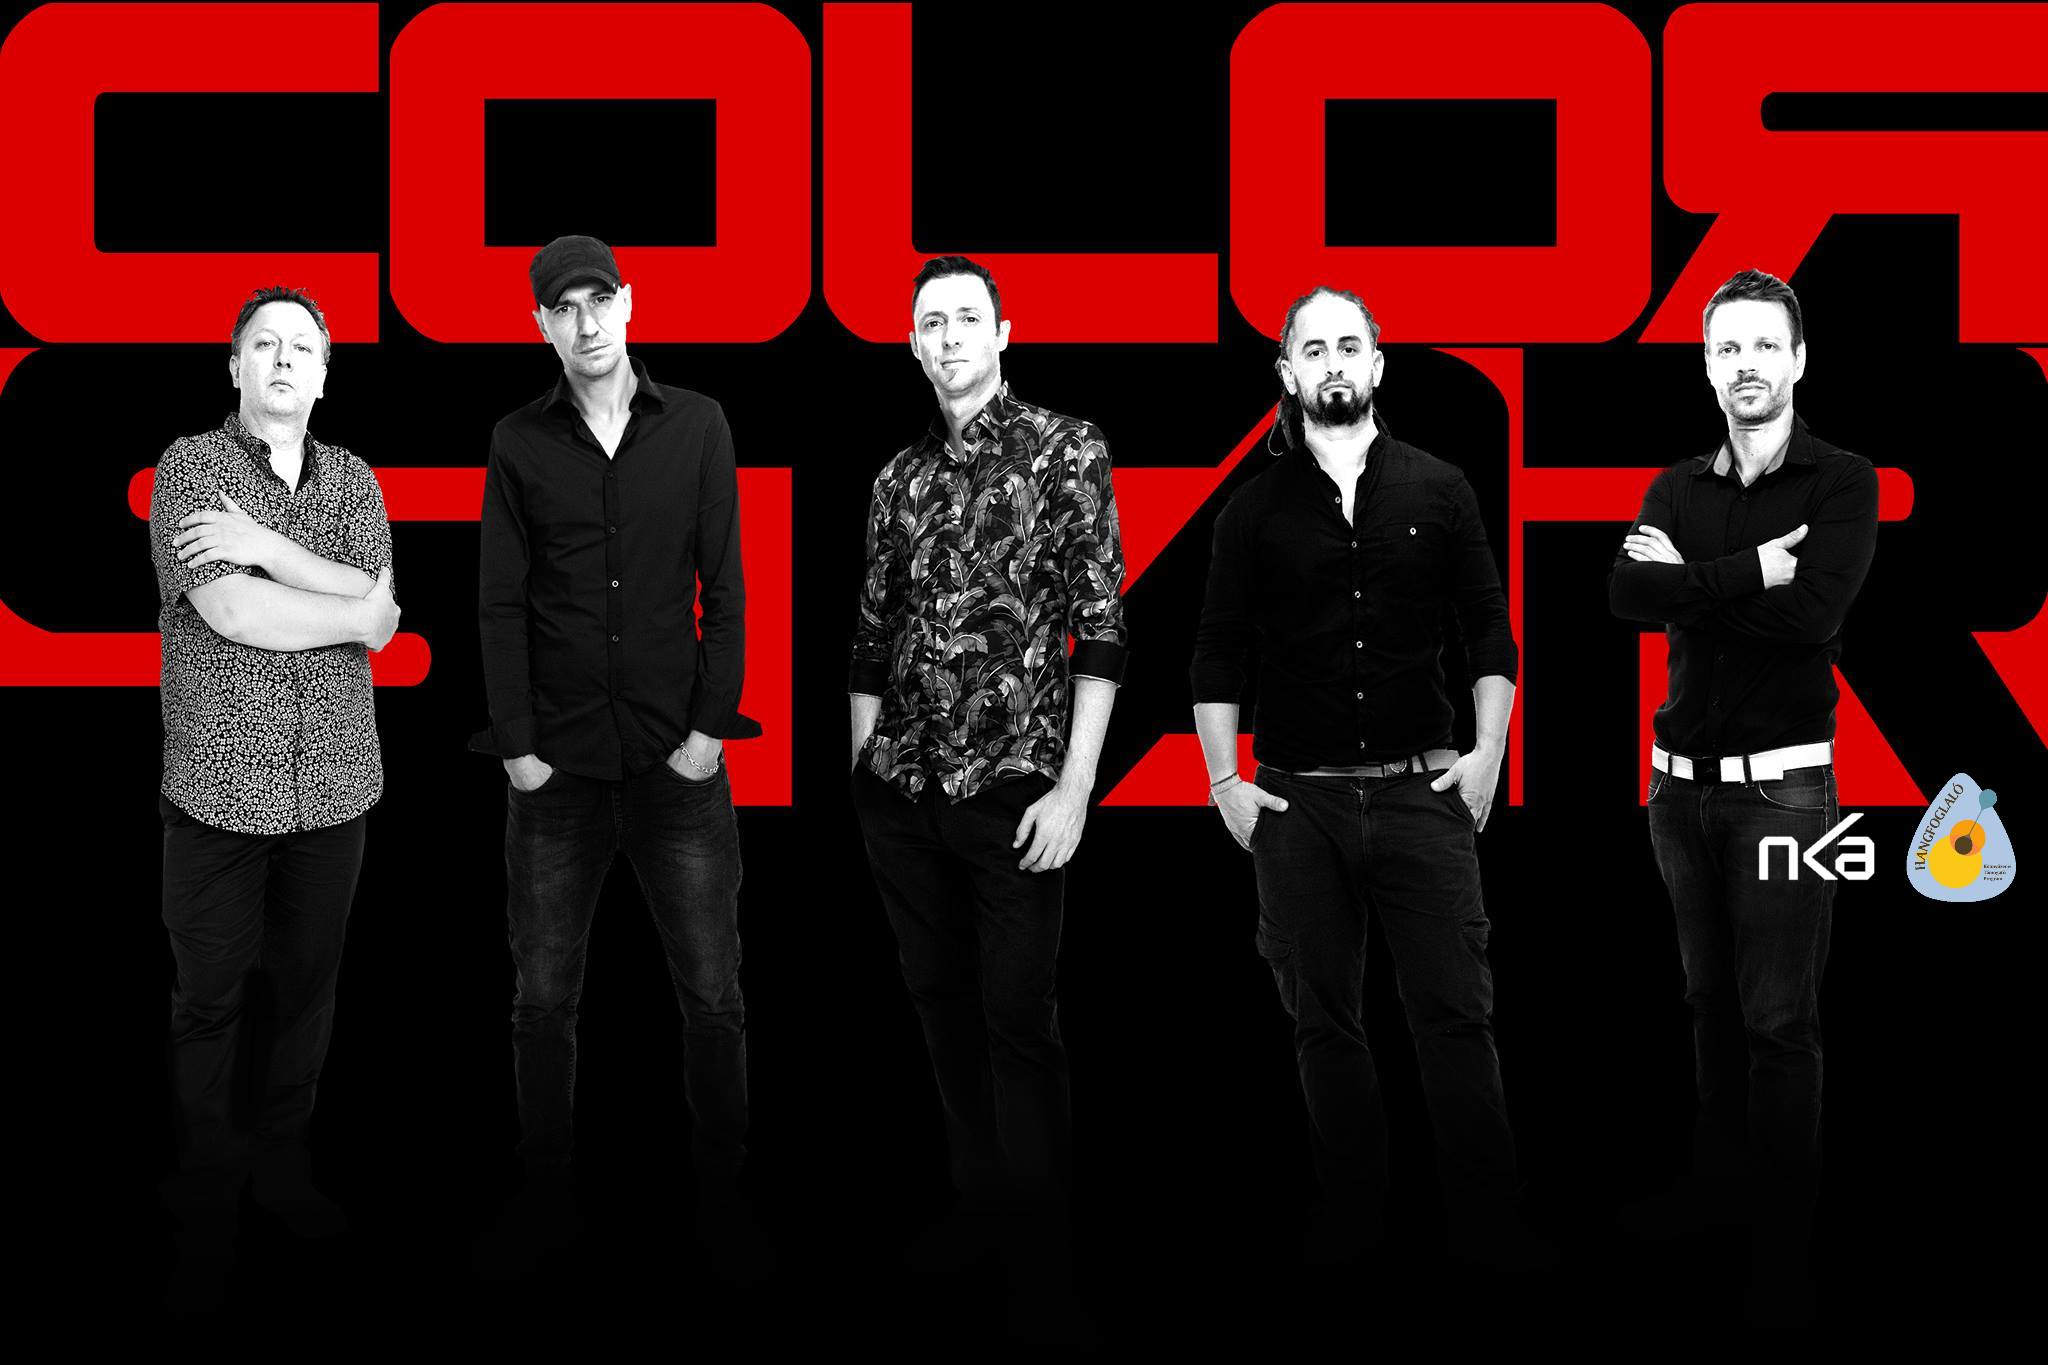 Colorstar turné, Románia, Cluj Napoca, Timisoara, Satu Mare, Sepsiszentgyörgy - 2019 március